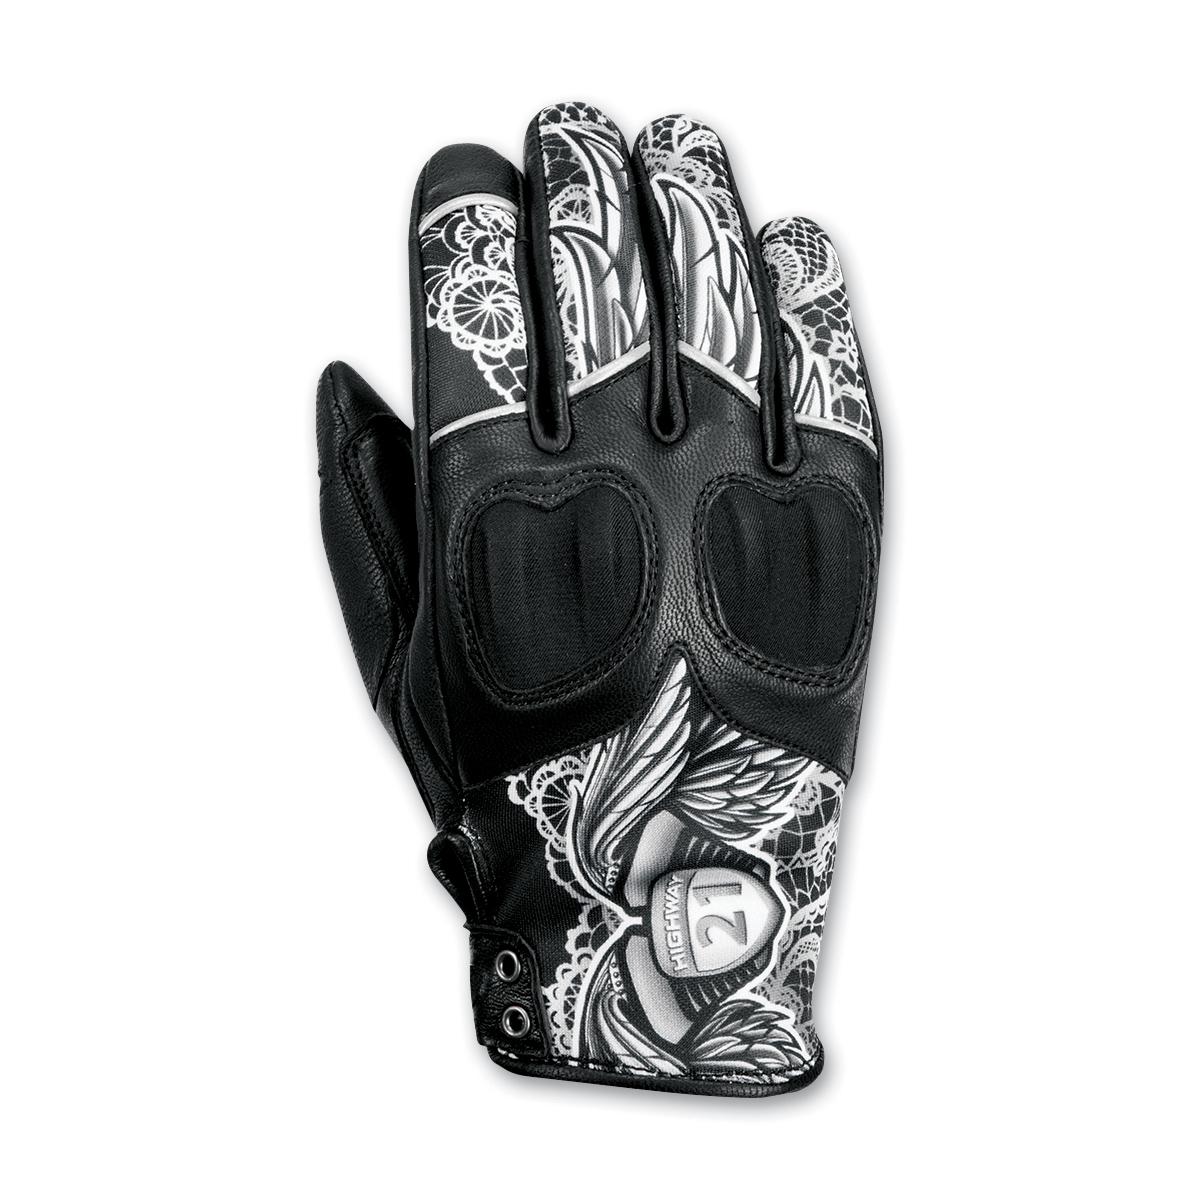 Highway 21 Women's Vixen Black/White Leather Gloves